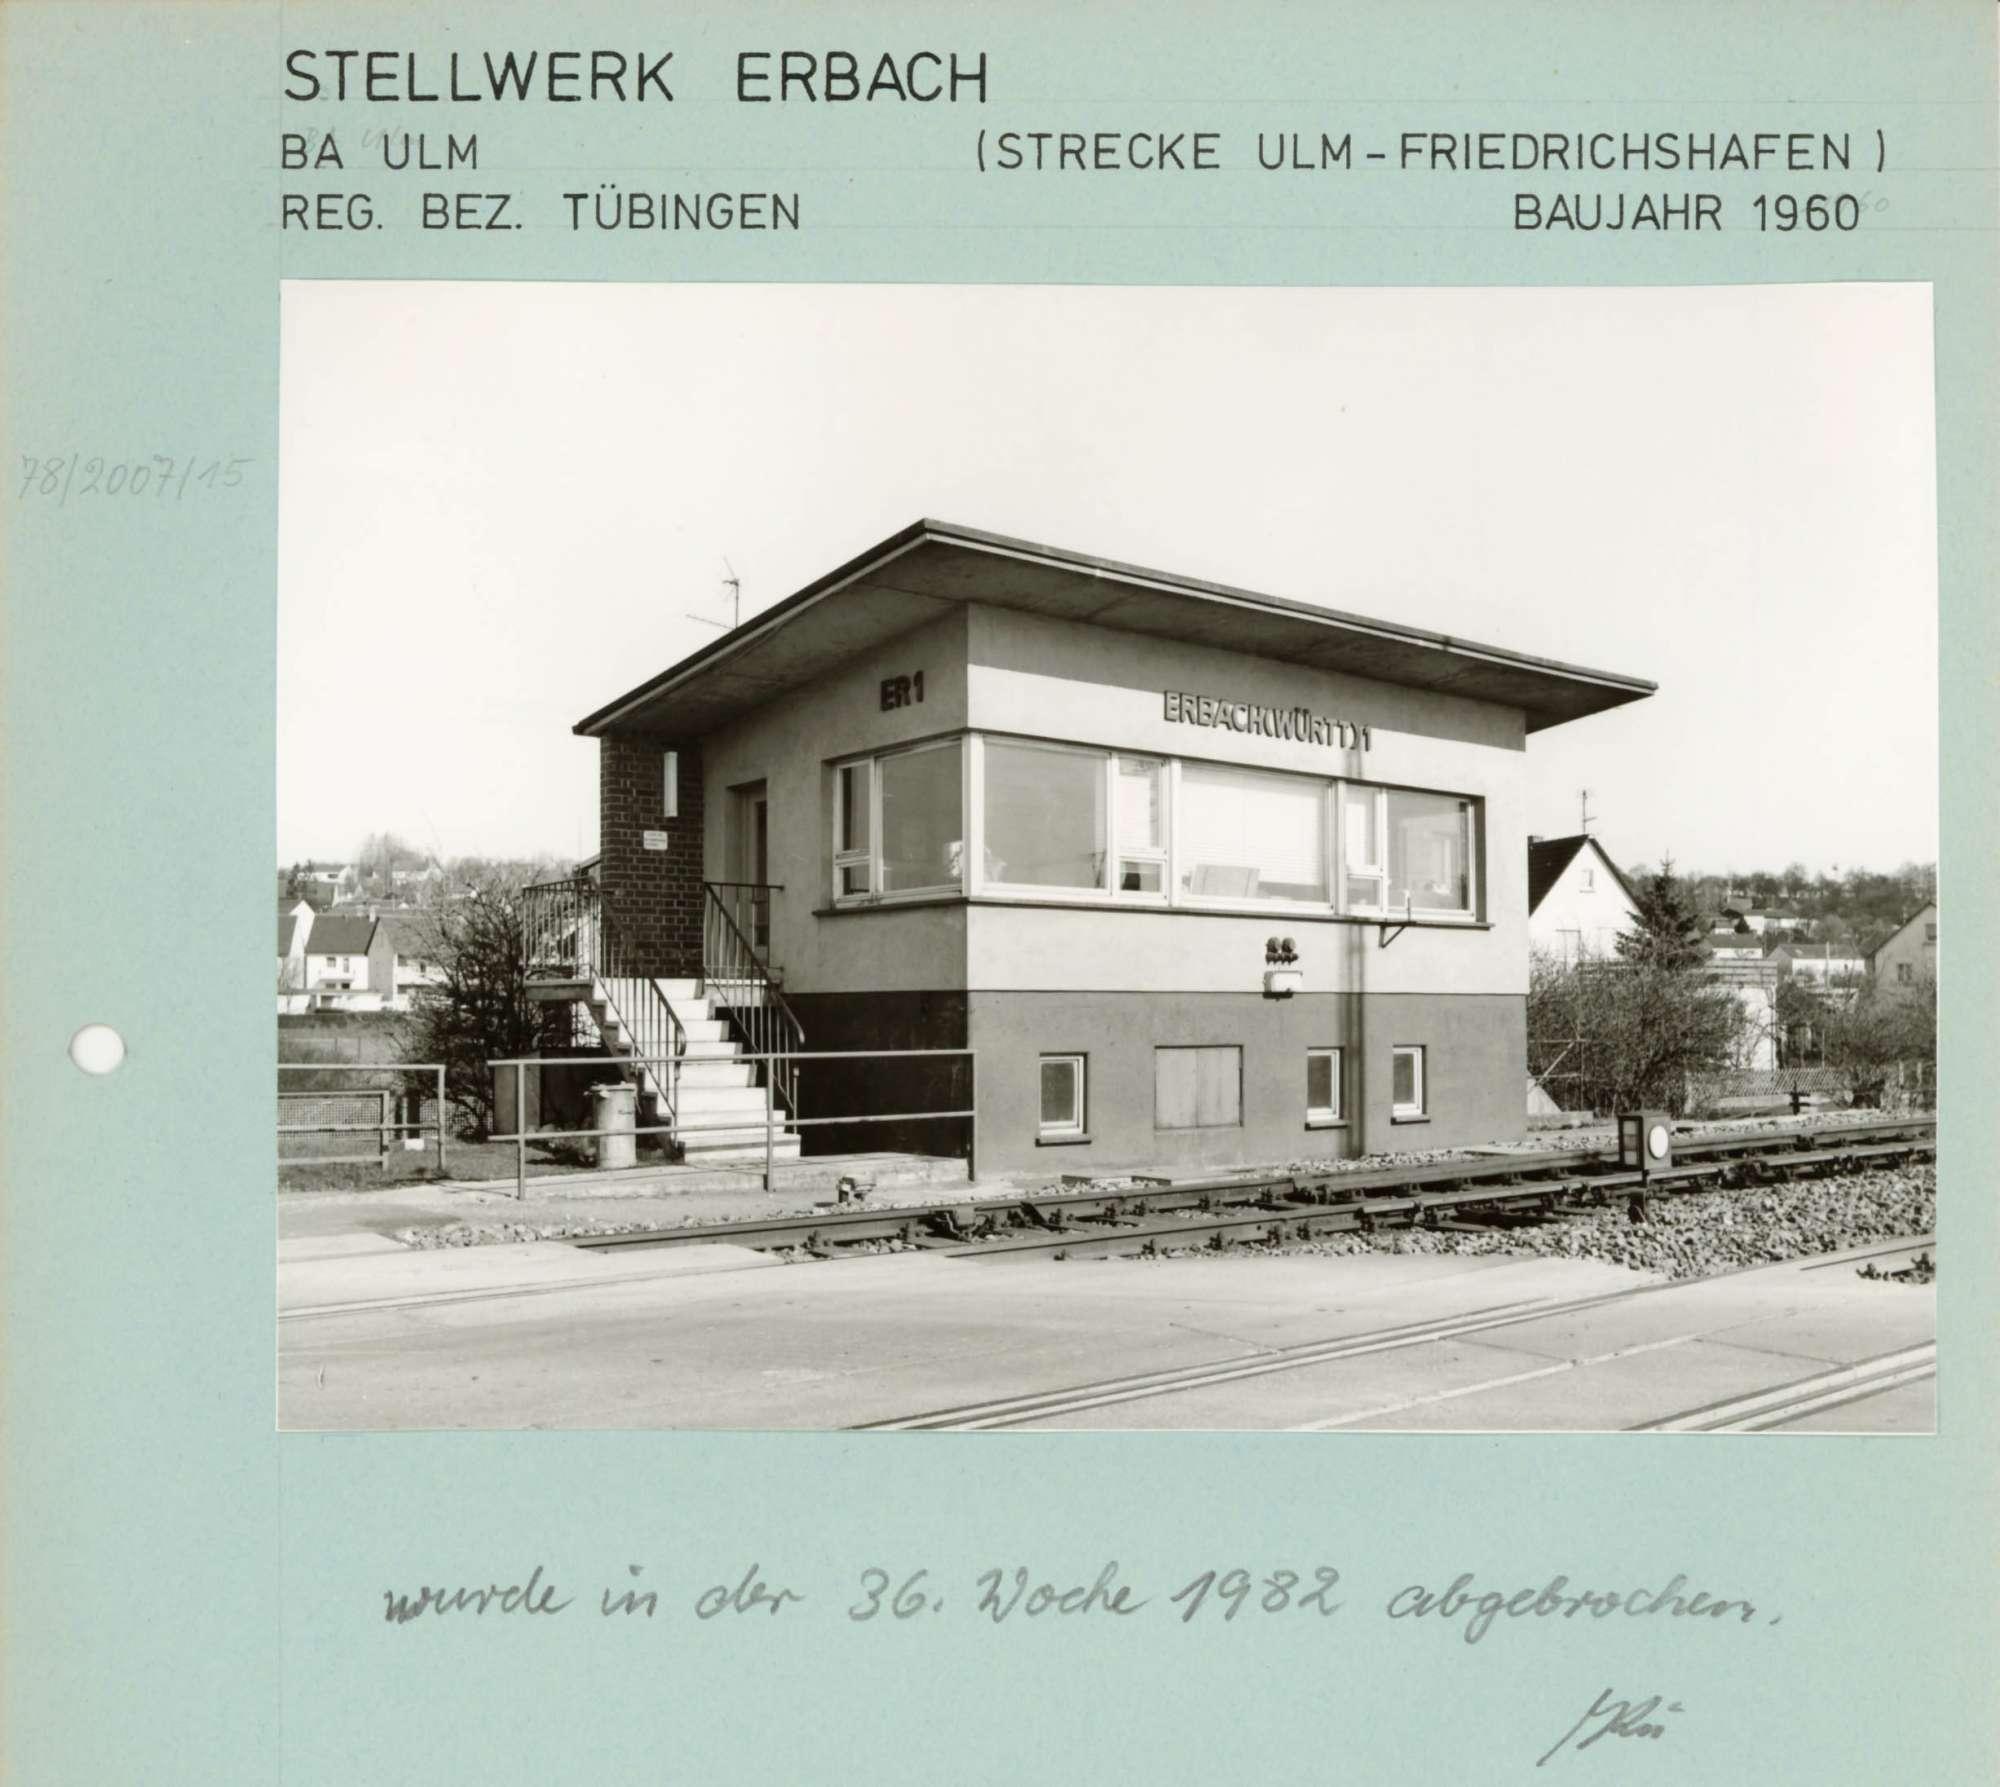 Erbach: 6 Fotos u.a., Bild 2